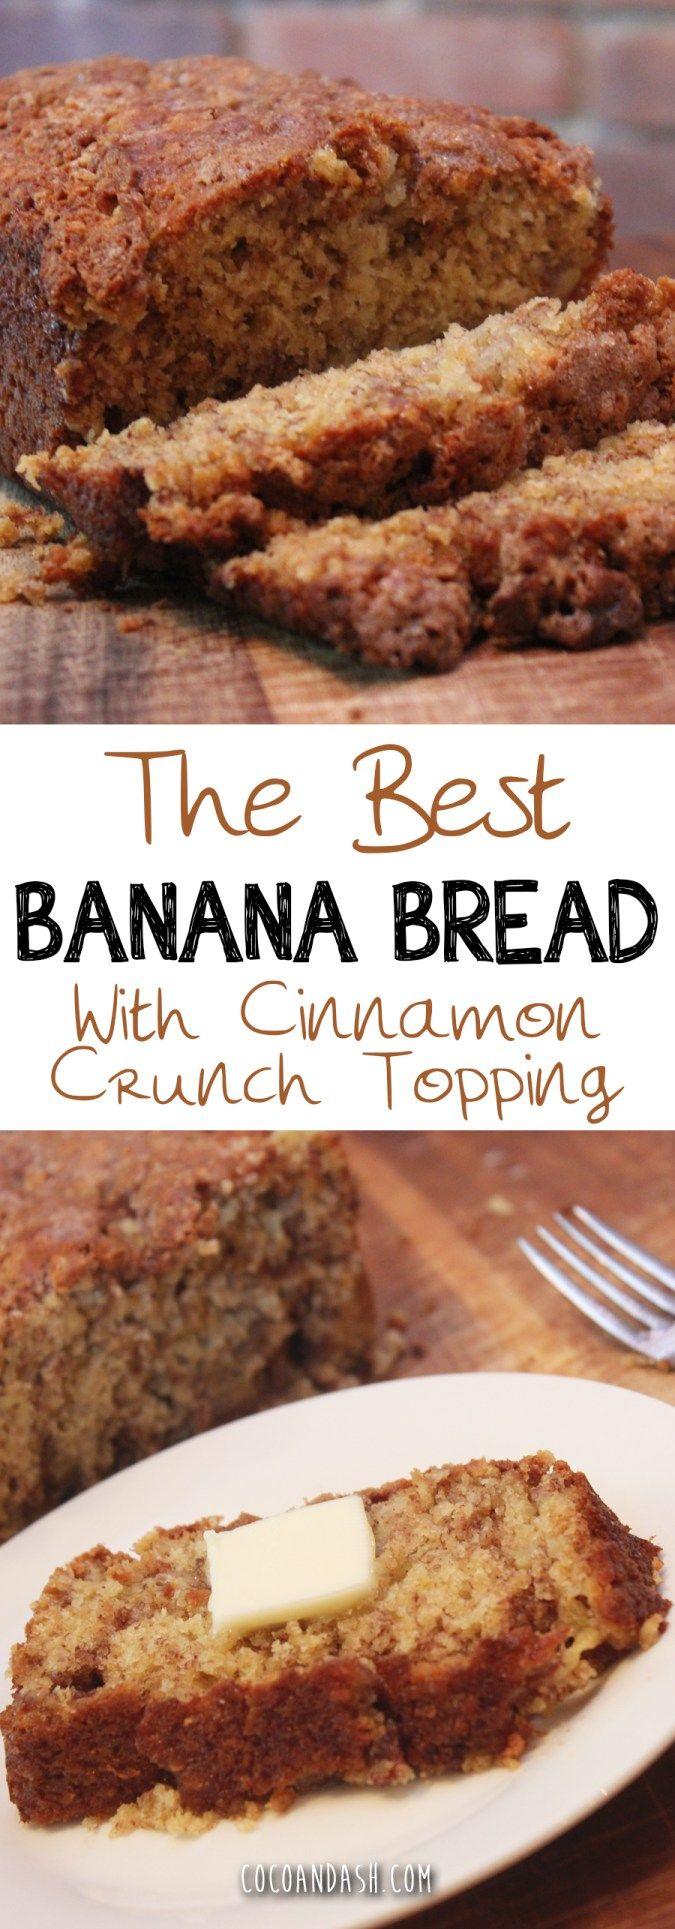 The Best Banana Bread, Cinnamon Crunch Banana Bread, banana bread, ripe bananas, breakfast, dessert, recipe, banana bread recipe, cinnamon banana bread,